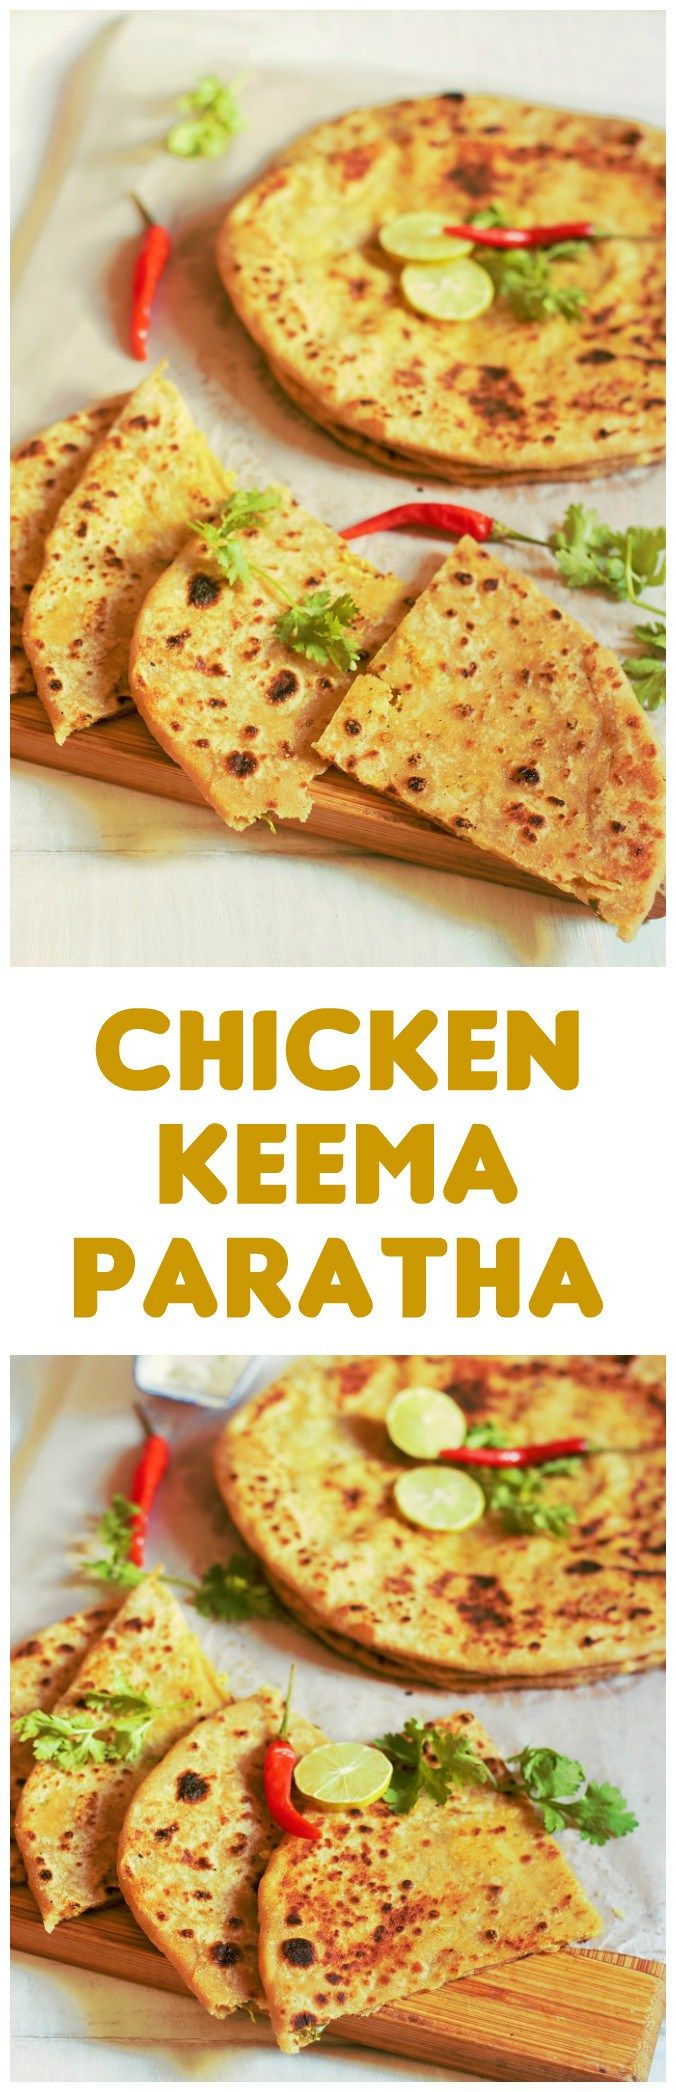 Chicken Keema Paratha Recipe-How to make chicken keema paratha-An awesome…